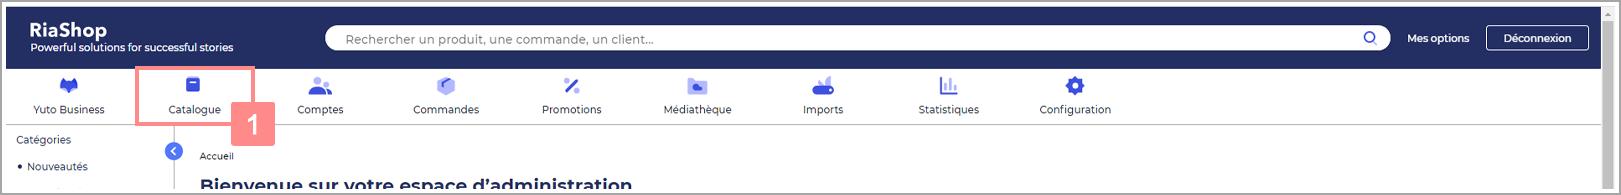 Rubrique Catalogue de l'administration RiaShop